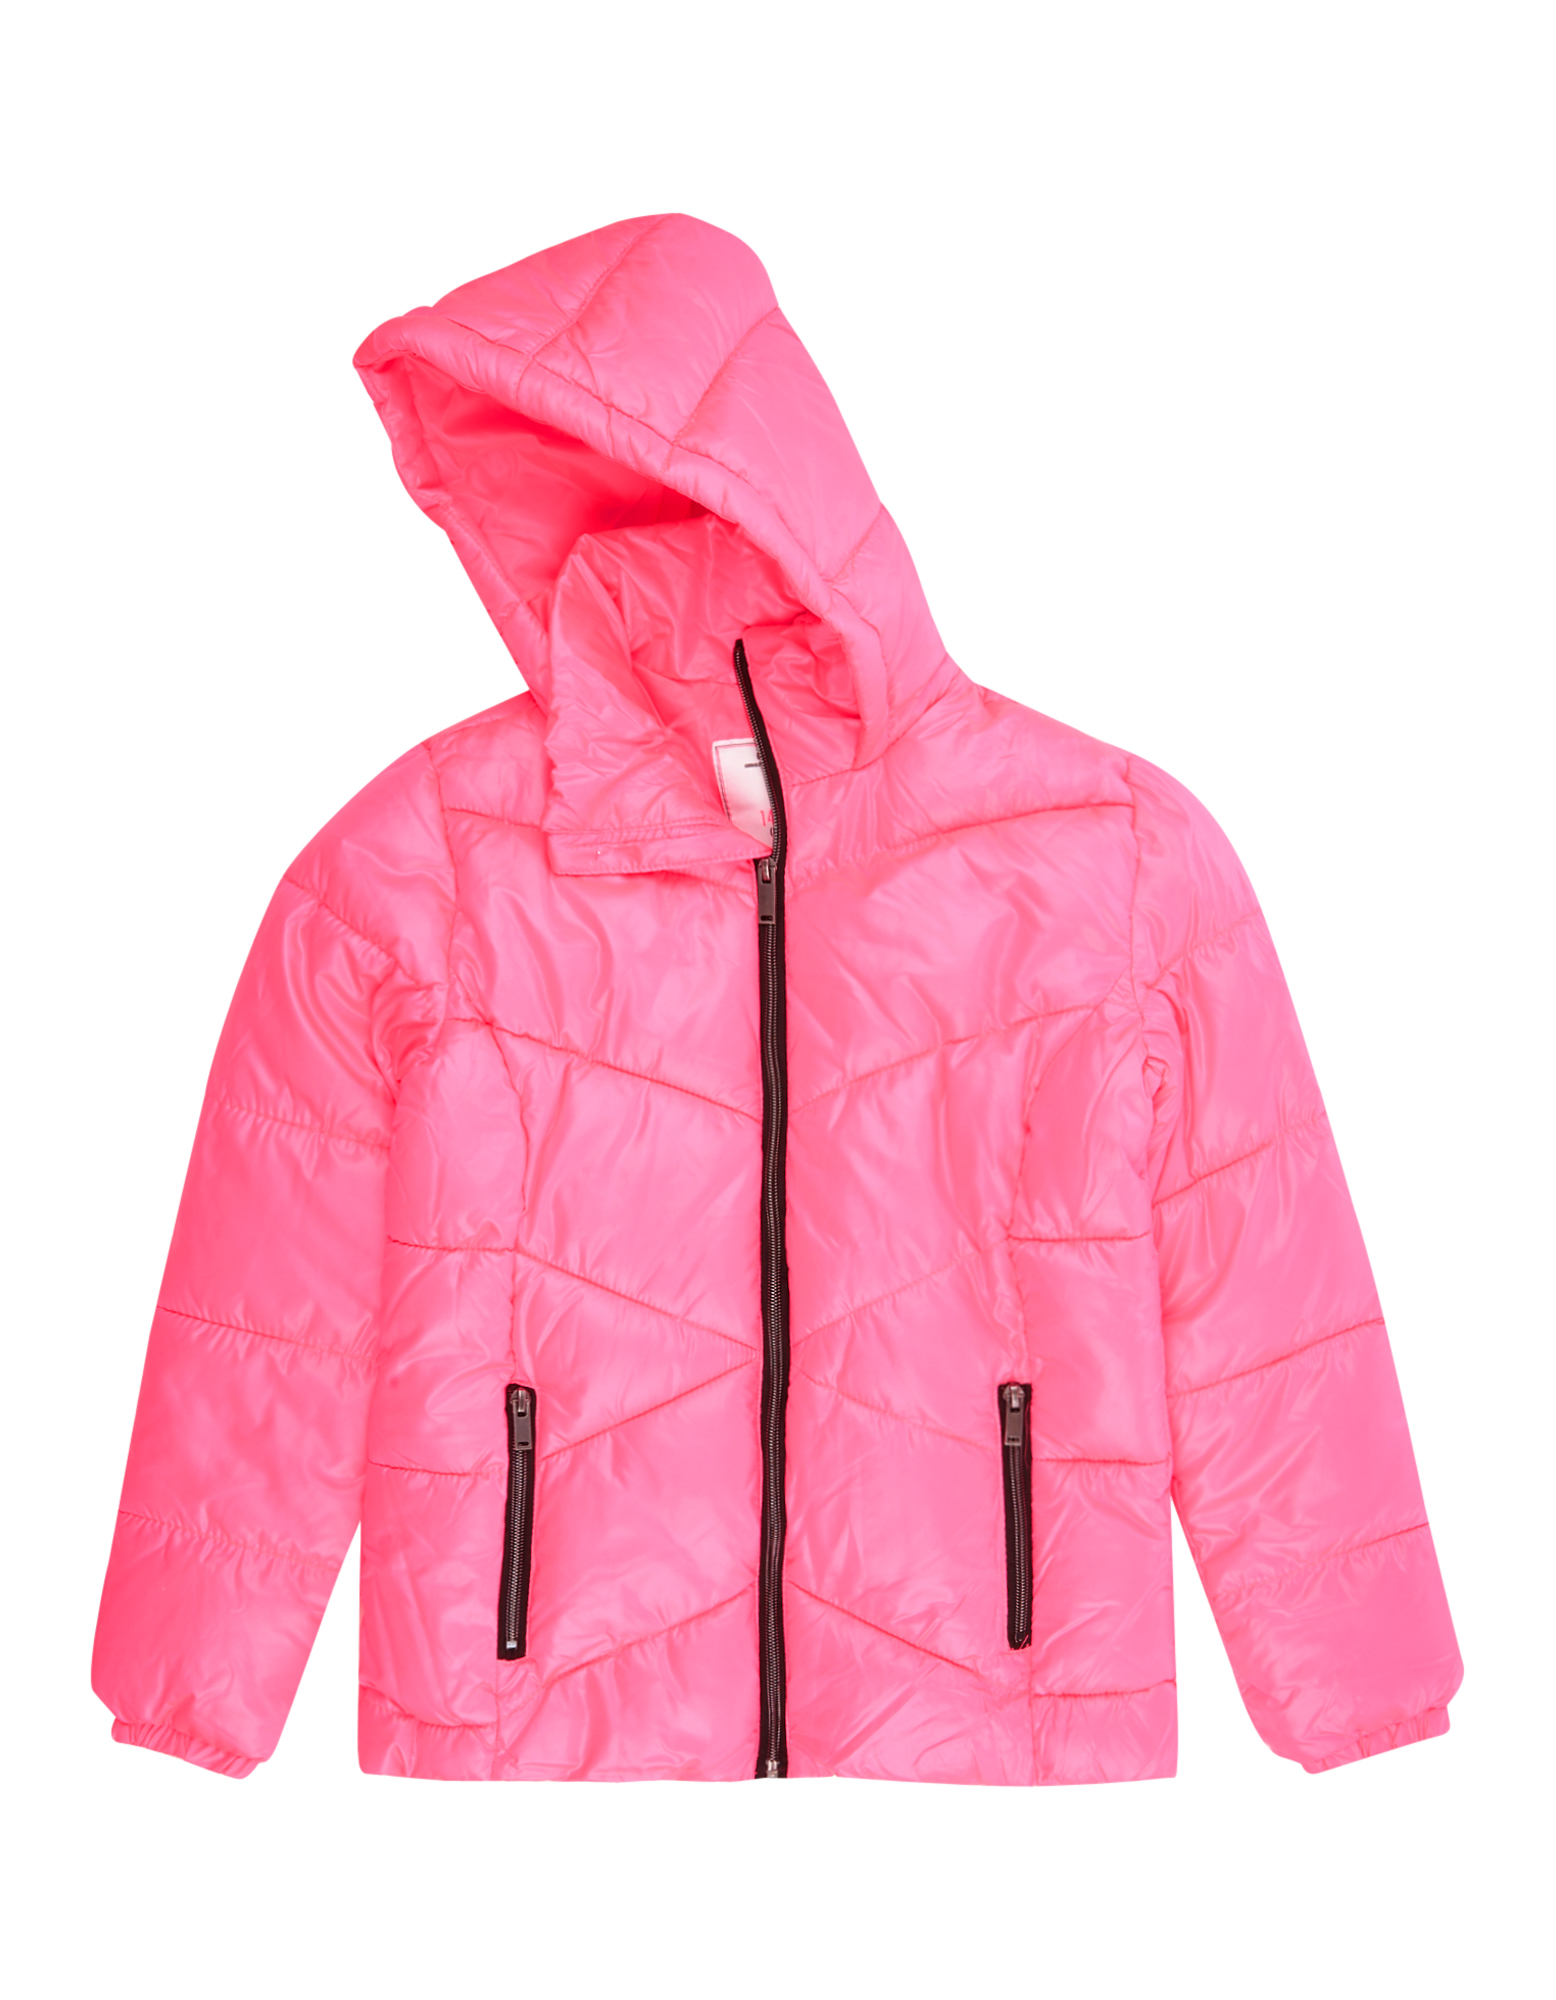 Mädchen Steppjacke mit Kapuze pink   81481744410303